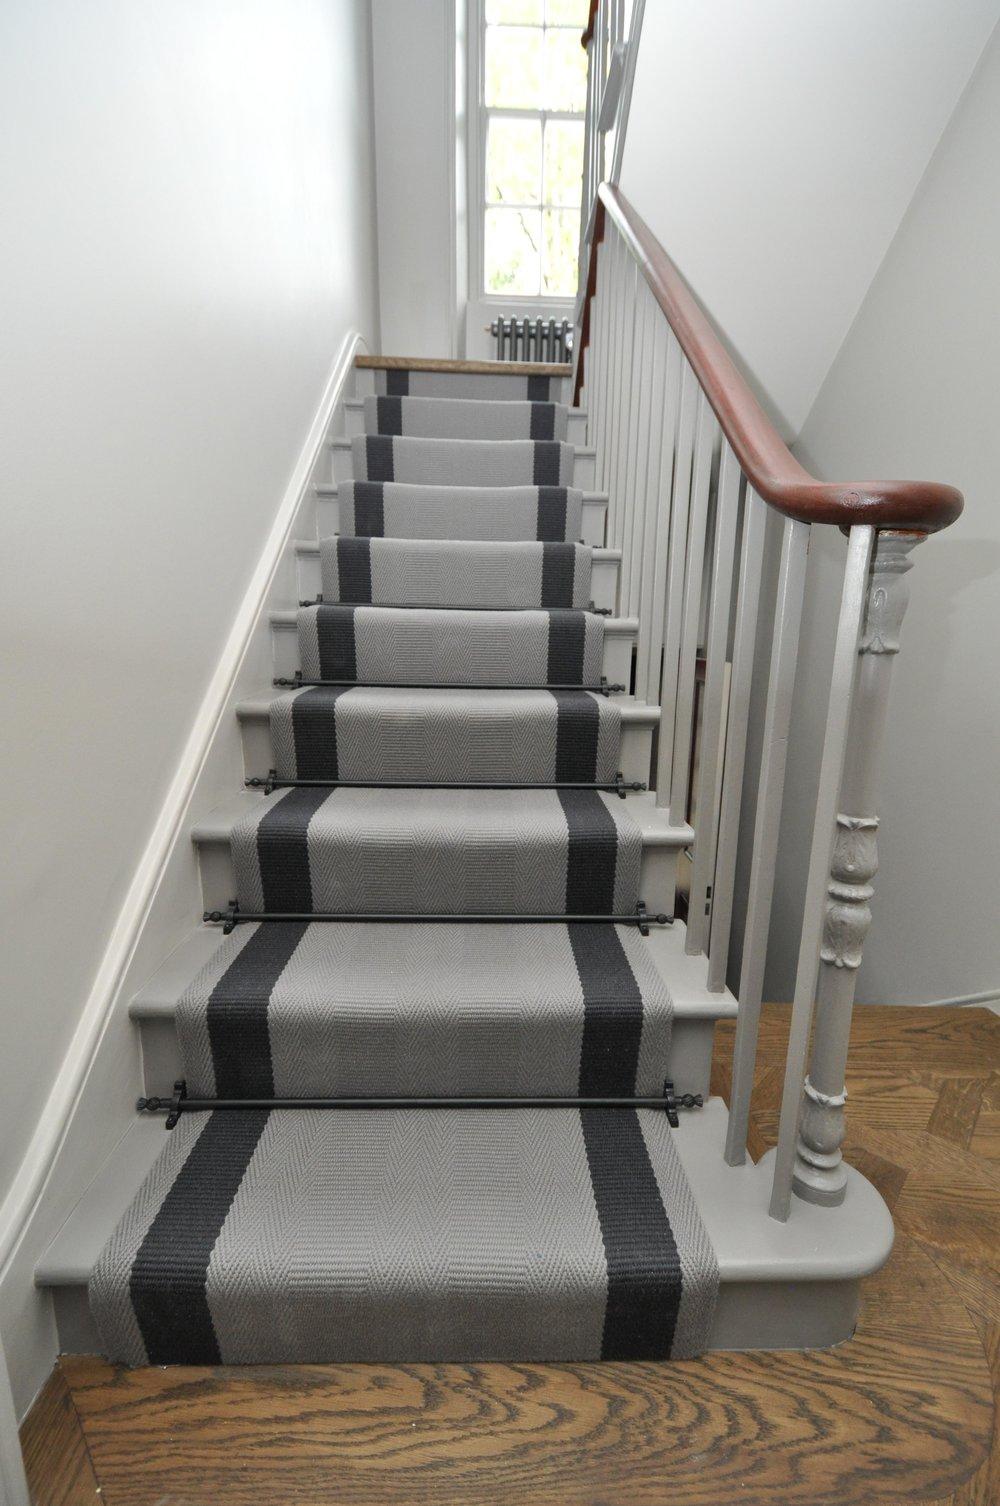 flatweave-stair-runner-london-bowloom-off-the-loom-geometric-carpet-DSC_1137.jpg